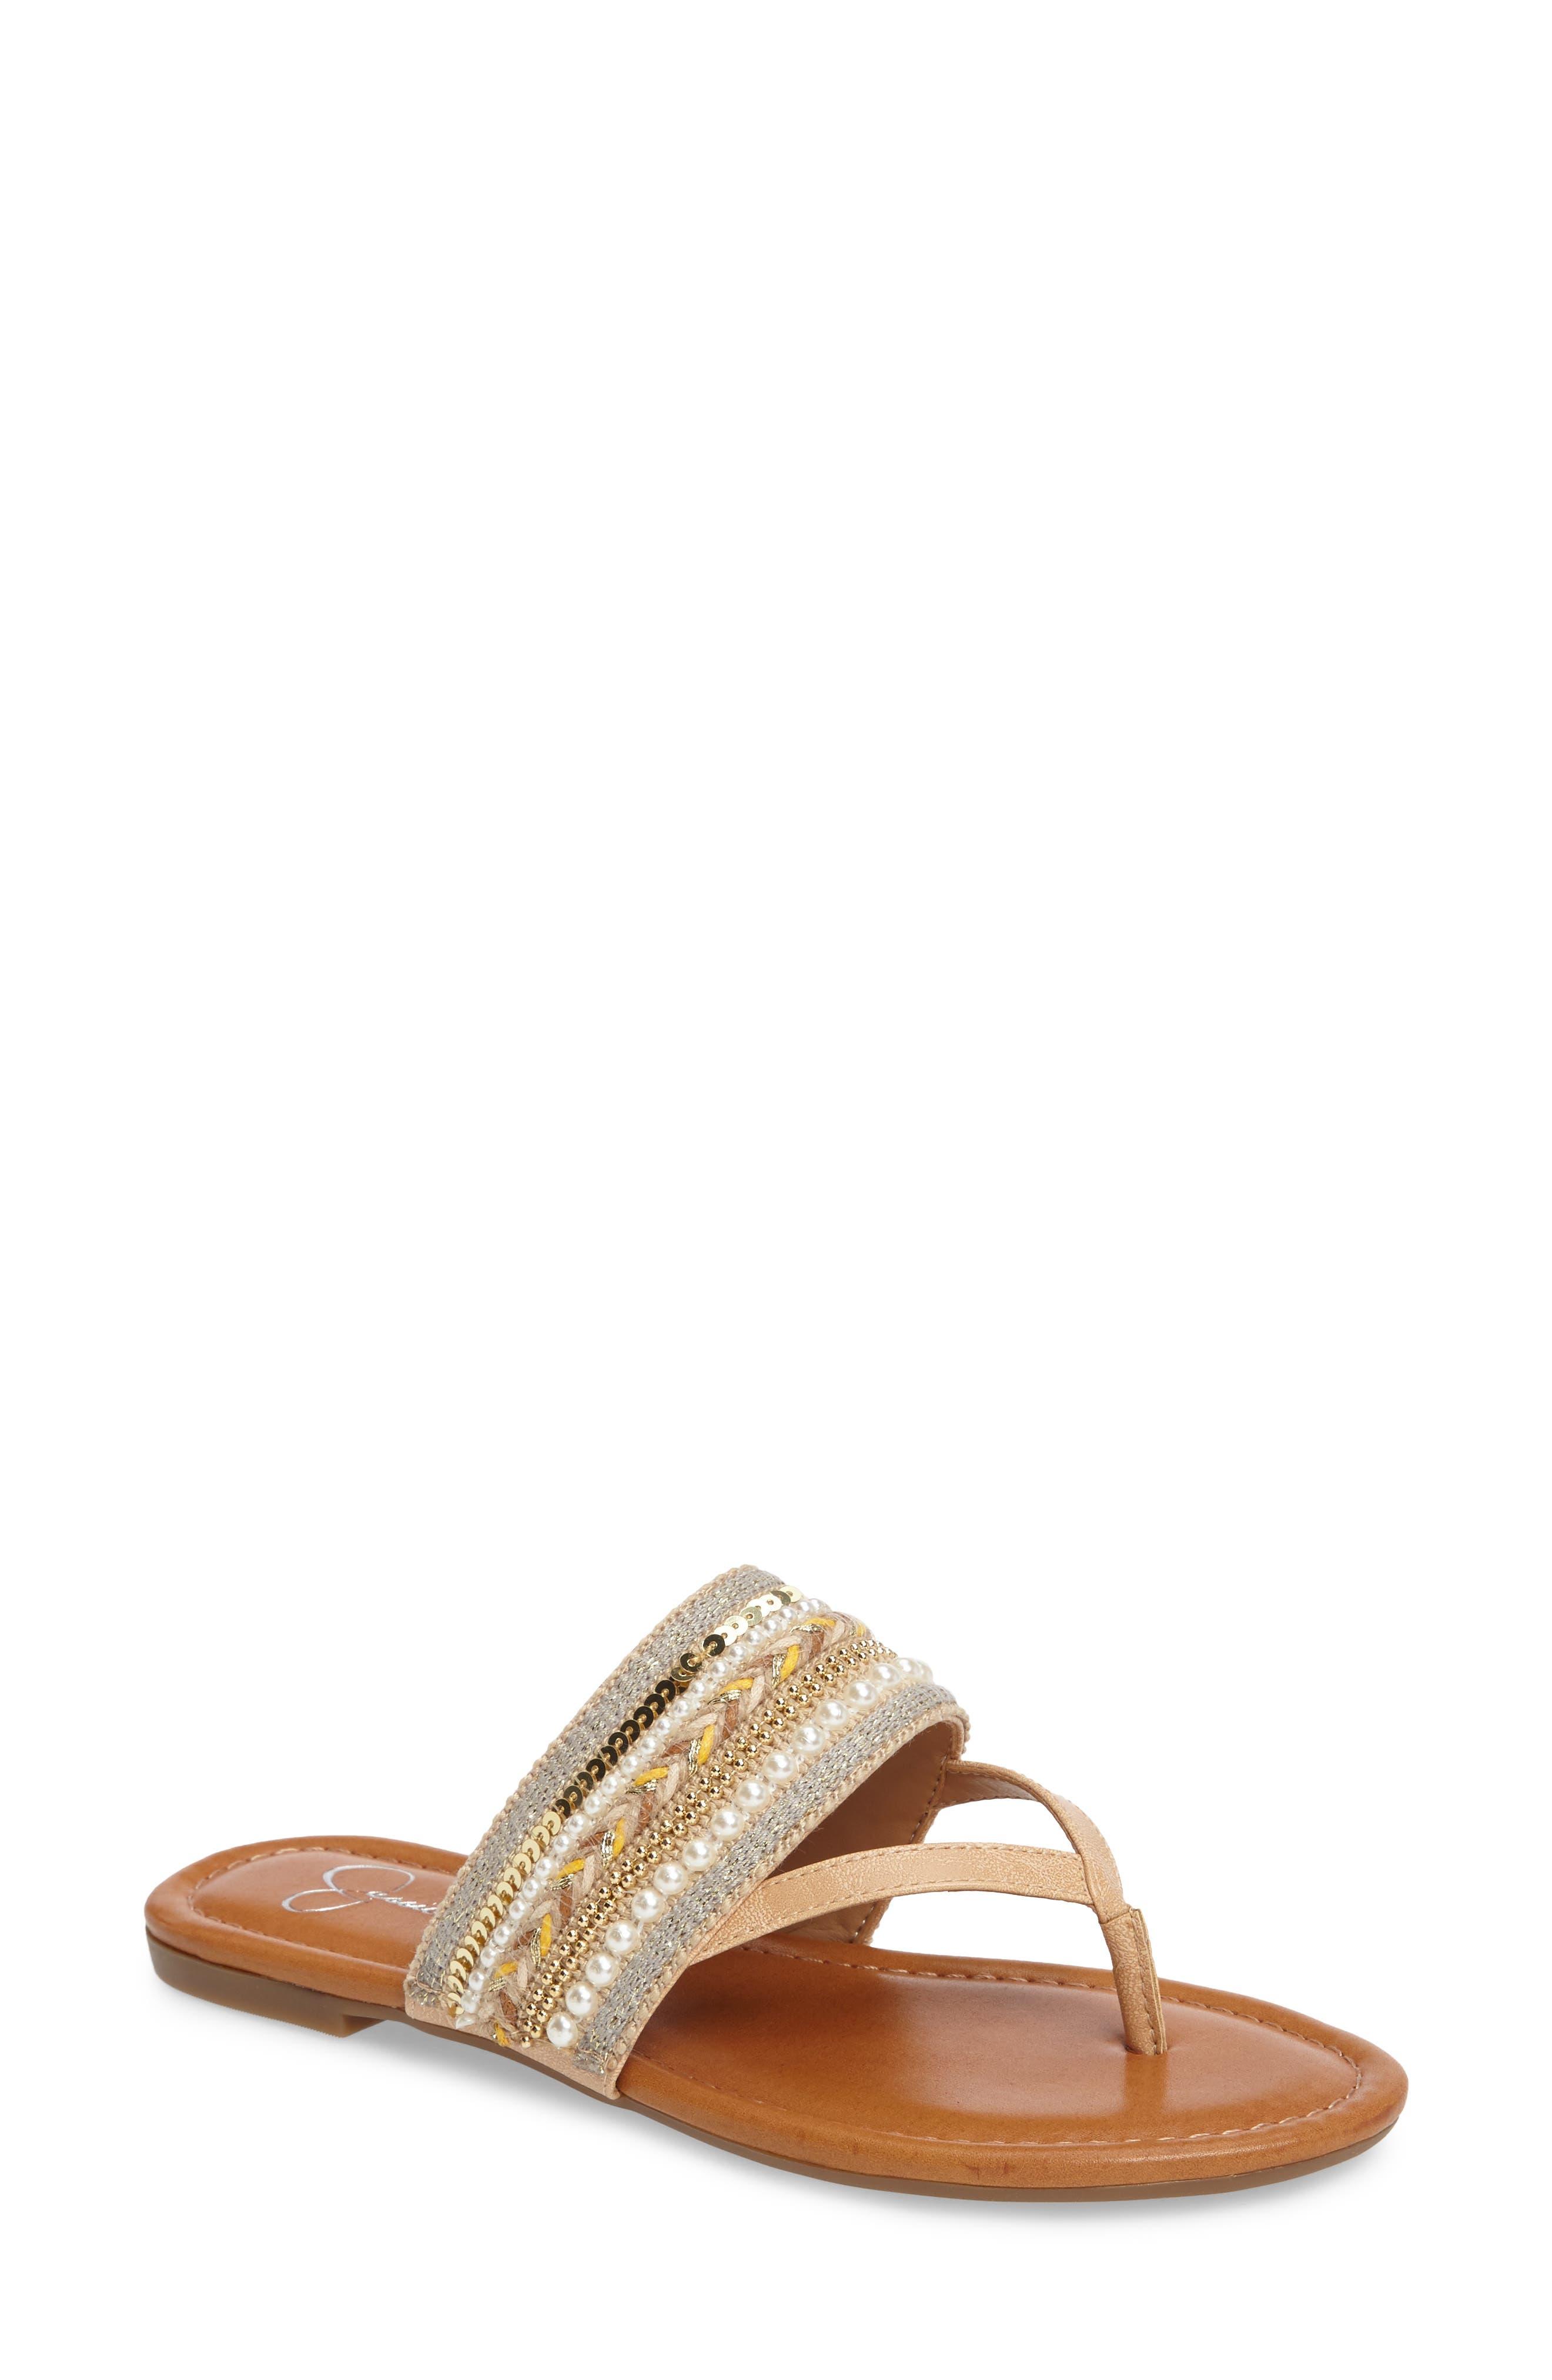 Alternate Image 1 Selected - Jessica Simpson Ronette Embellished Flip Flop (Women)